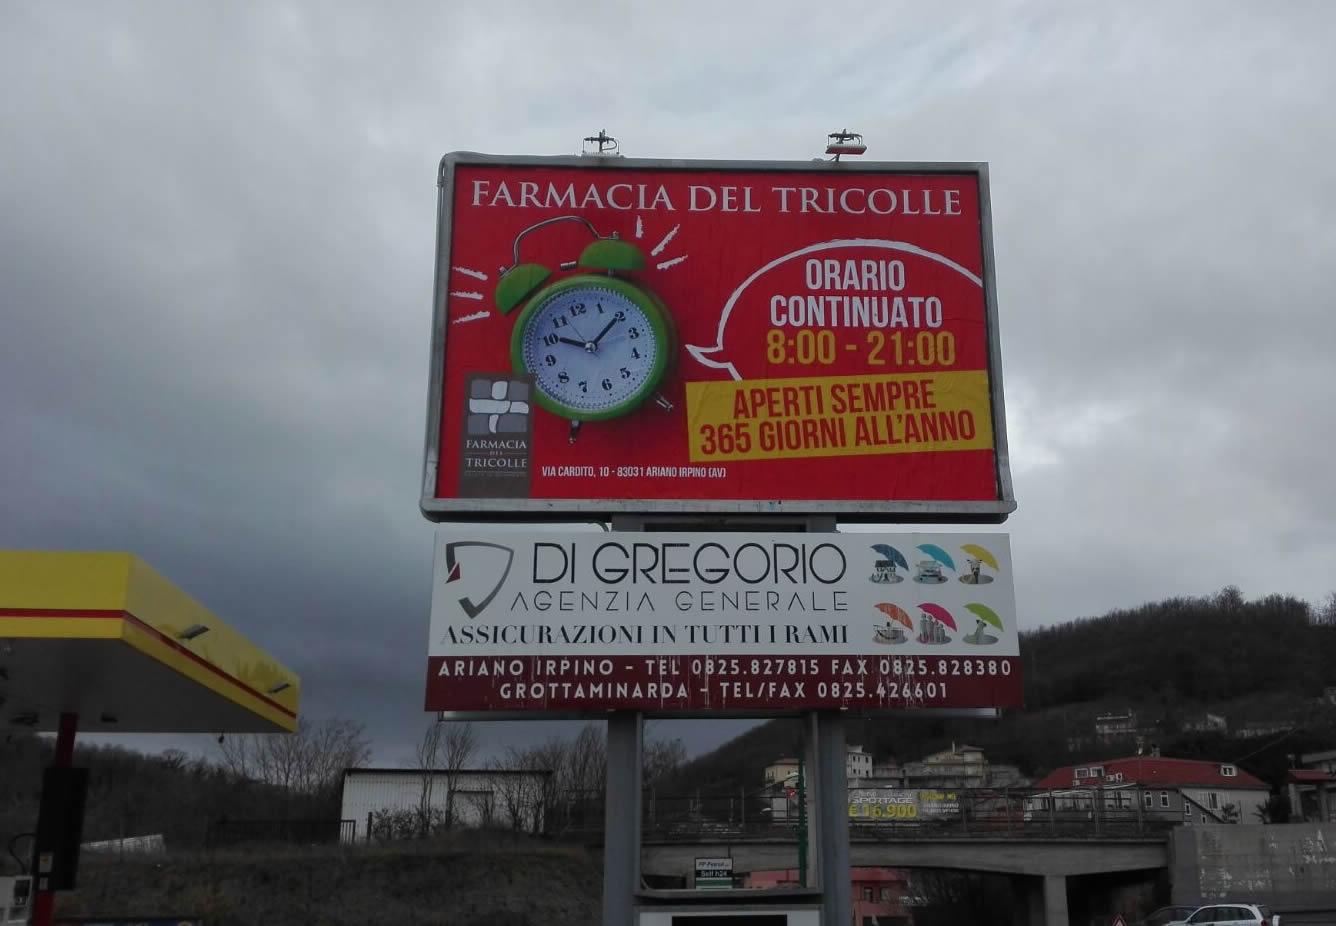 Impianto affissioni 3x2 Ariano Irpino (Avellino)